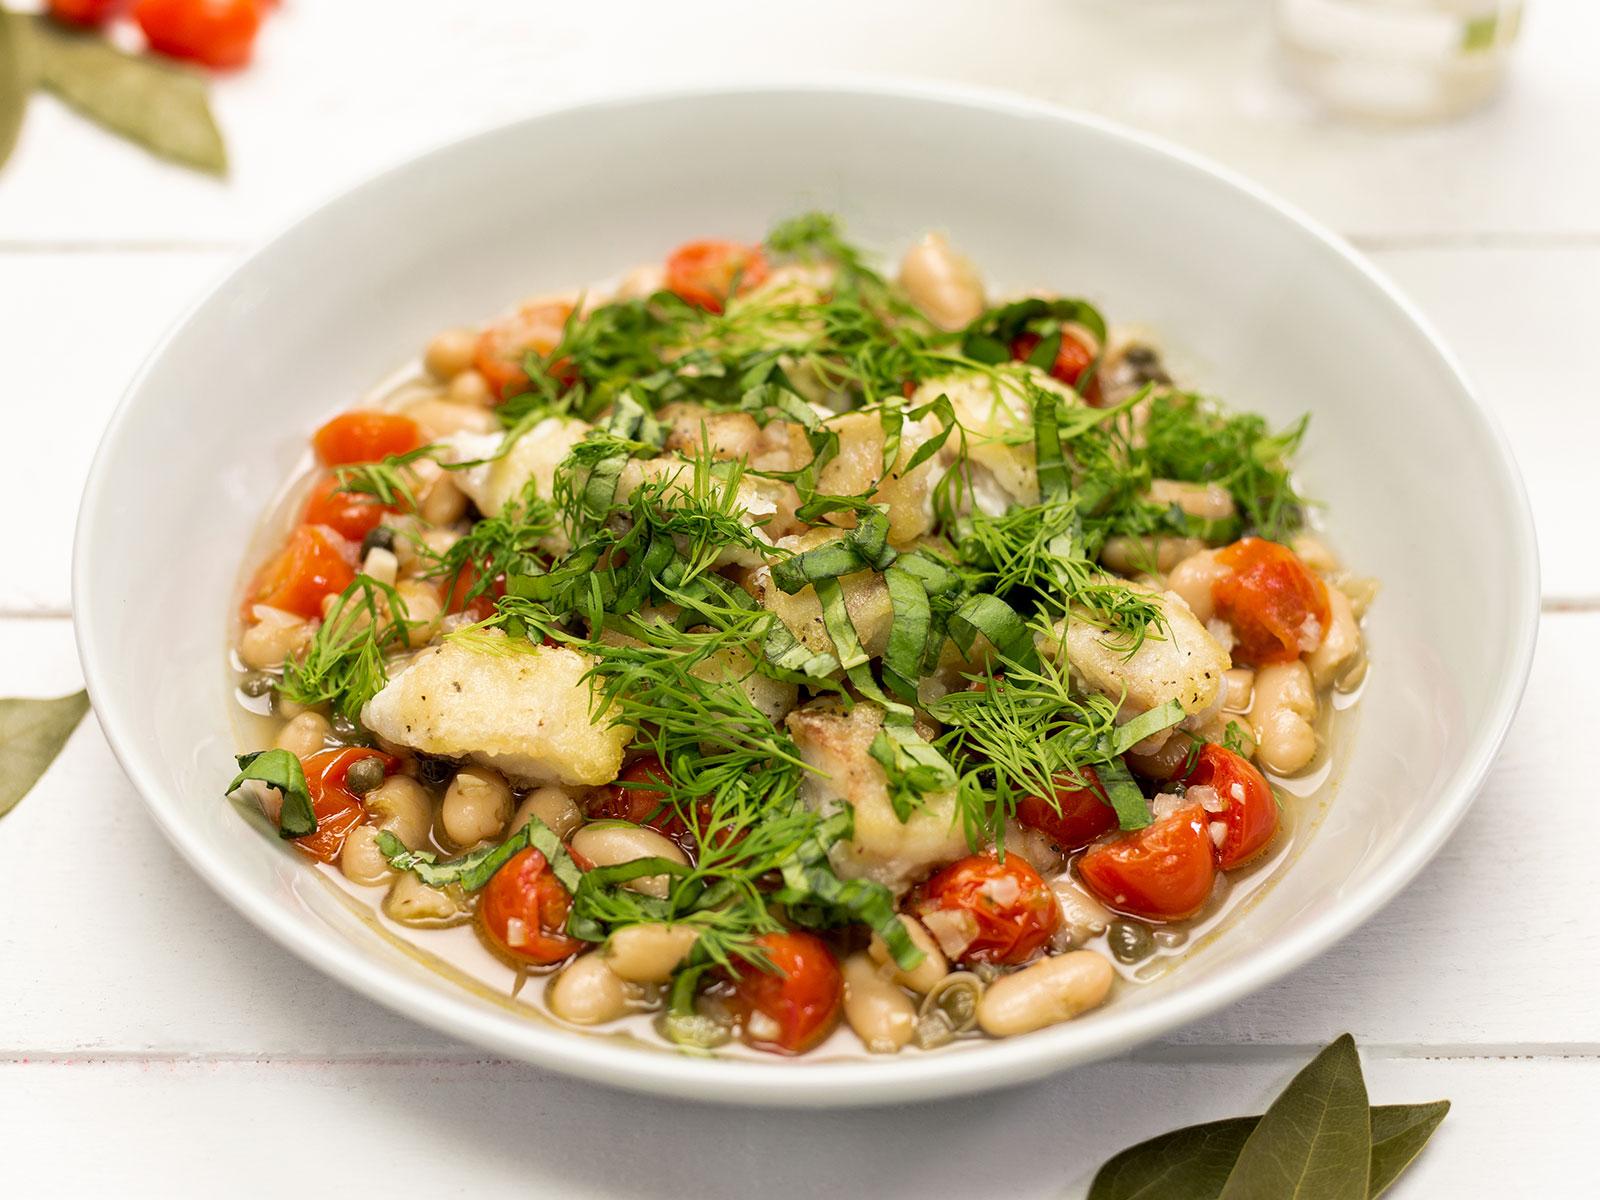 Hearty White Bean Stew with Wild Alaskan Pollock